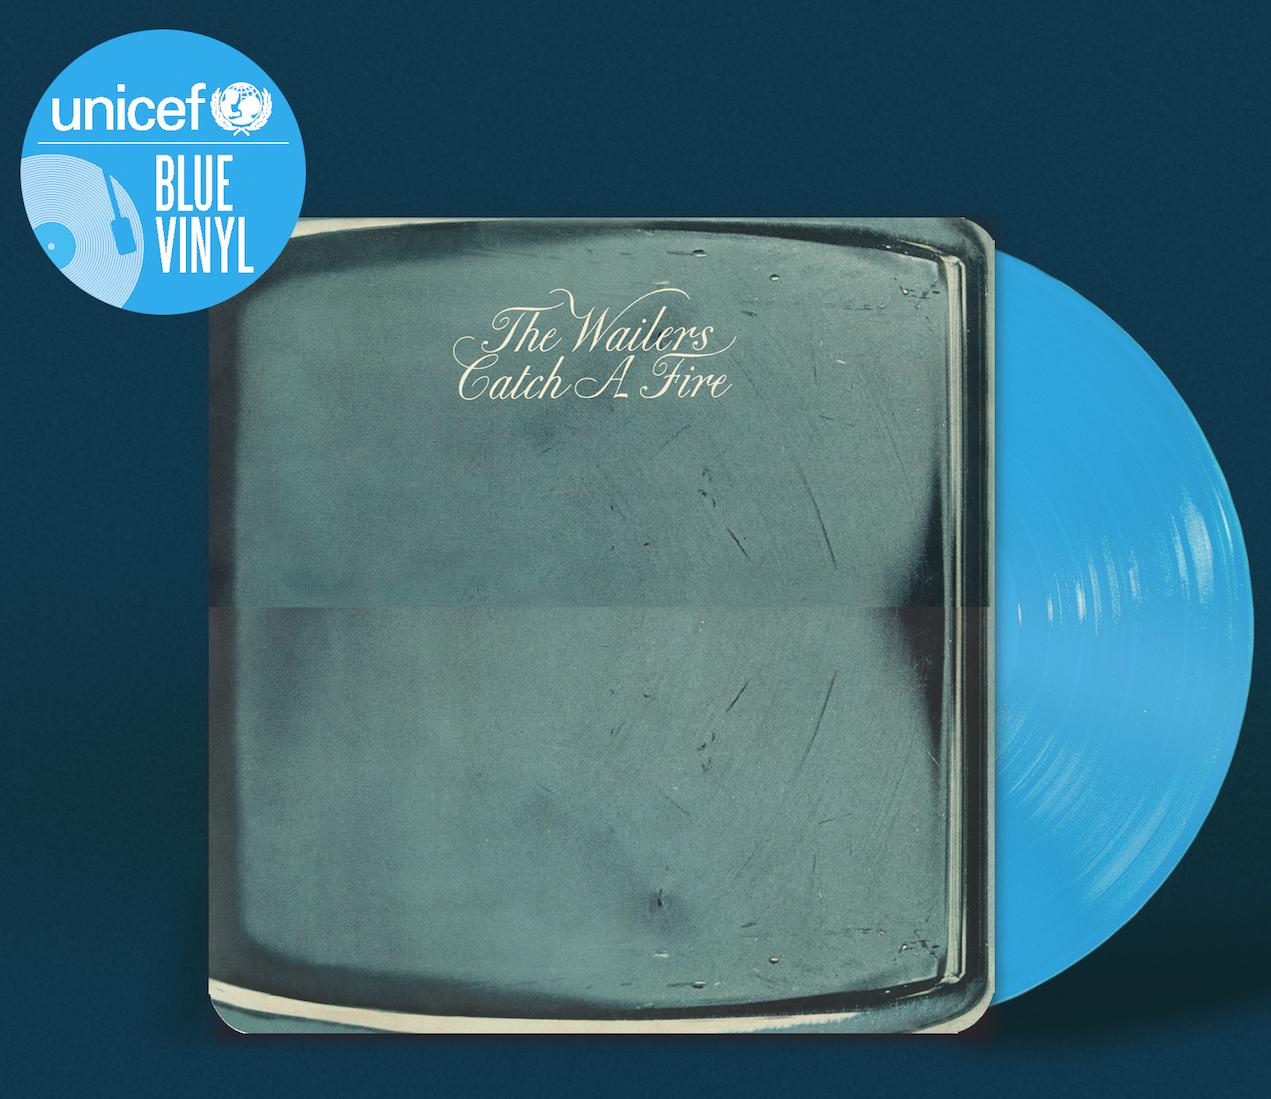 UNICEF BLUE VINYL: 16 SEMINAL ALBUMS